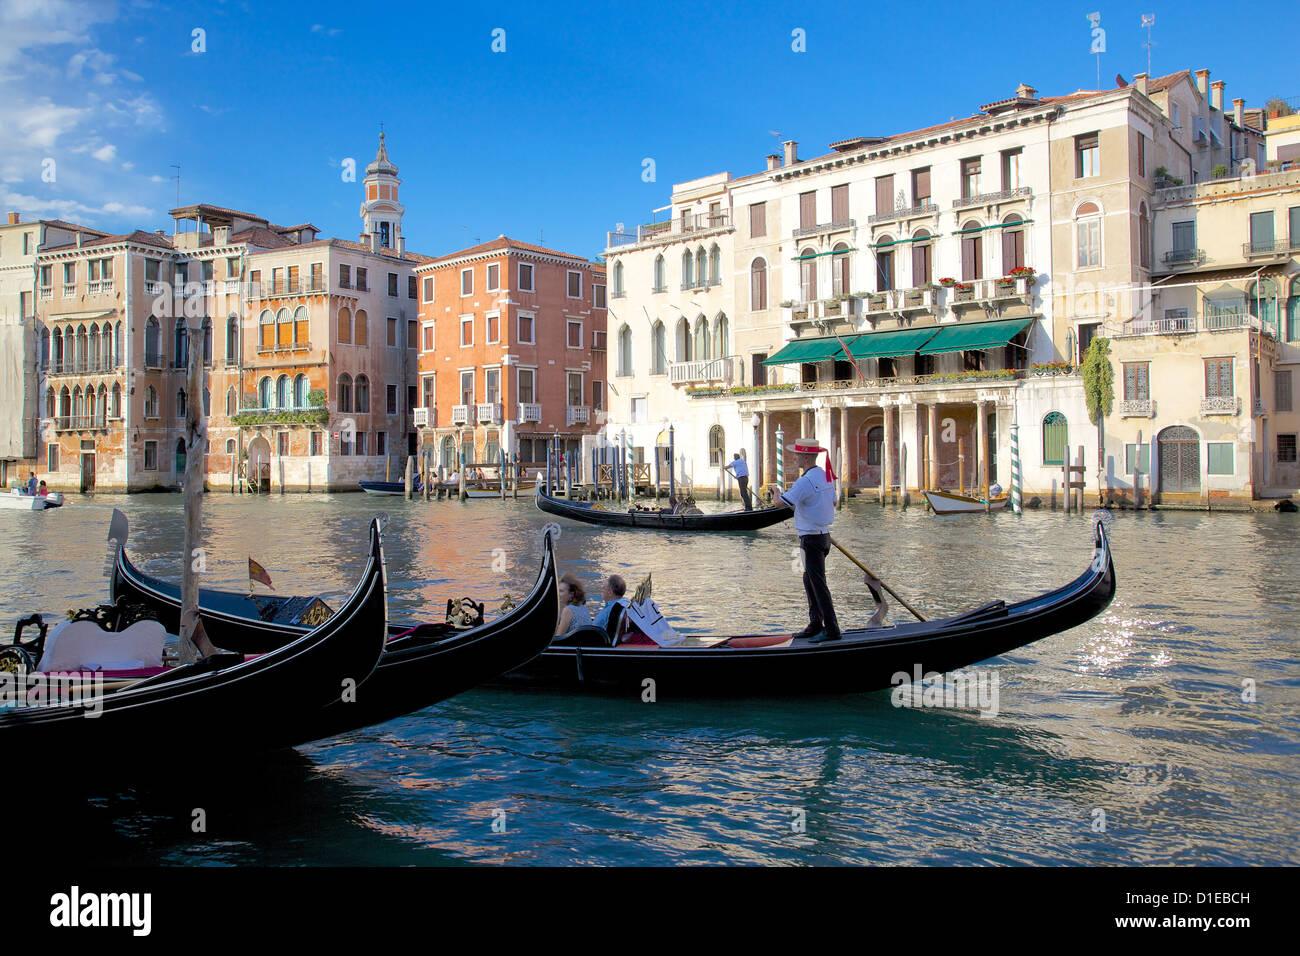 Gondolas on the Grand Canal, Venice, UNESCO World Heritage Site, Veneto, Italy, Europe Stock Photo